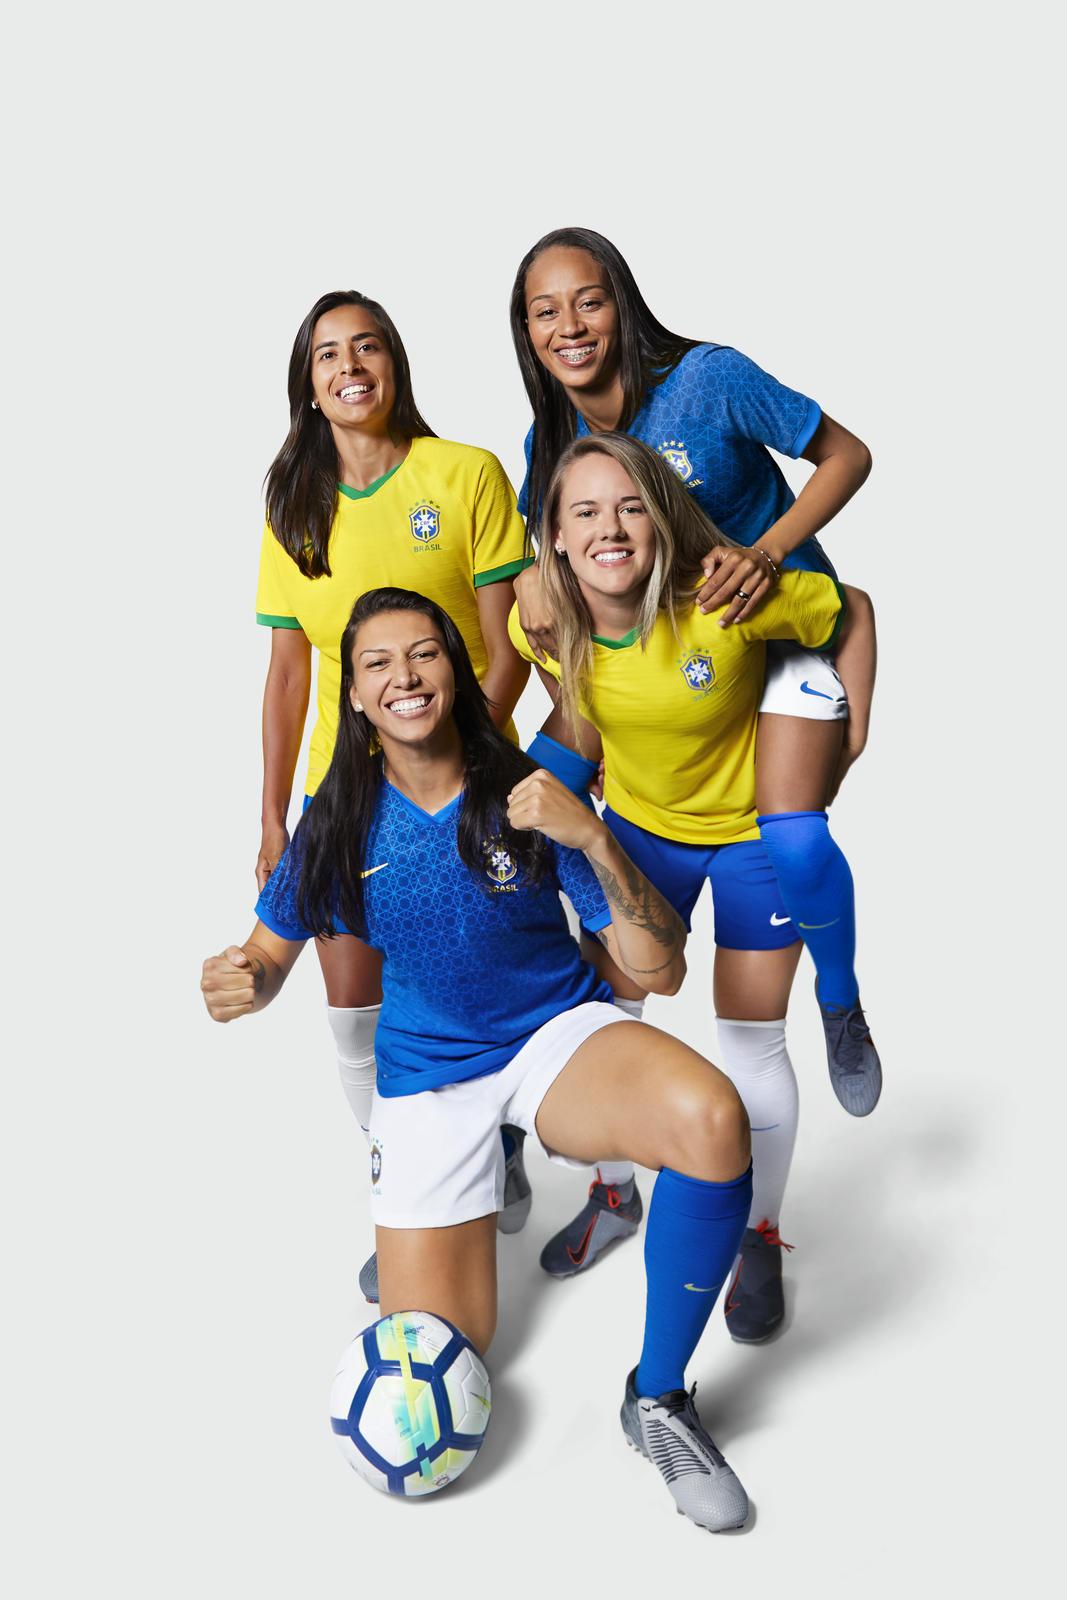 87f17c30f44 Brazil 2019 Women s World Cup Nike Kits - FOOTBALL FASHION.ORG